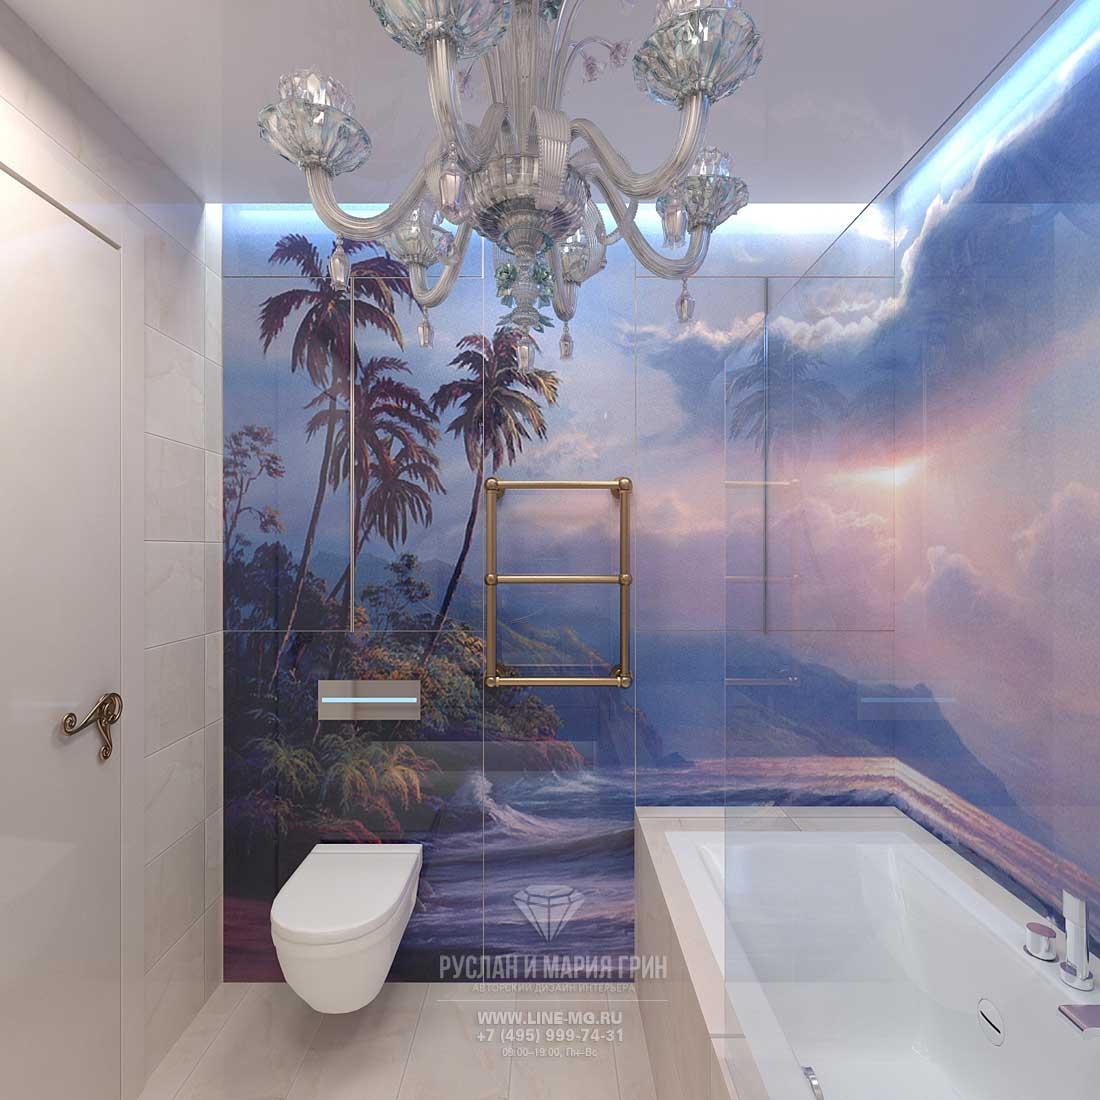 parizh-dizayn-proekt-interyera-ceny-08